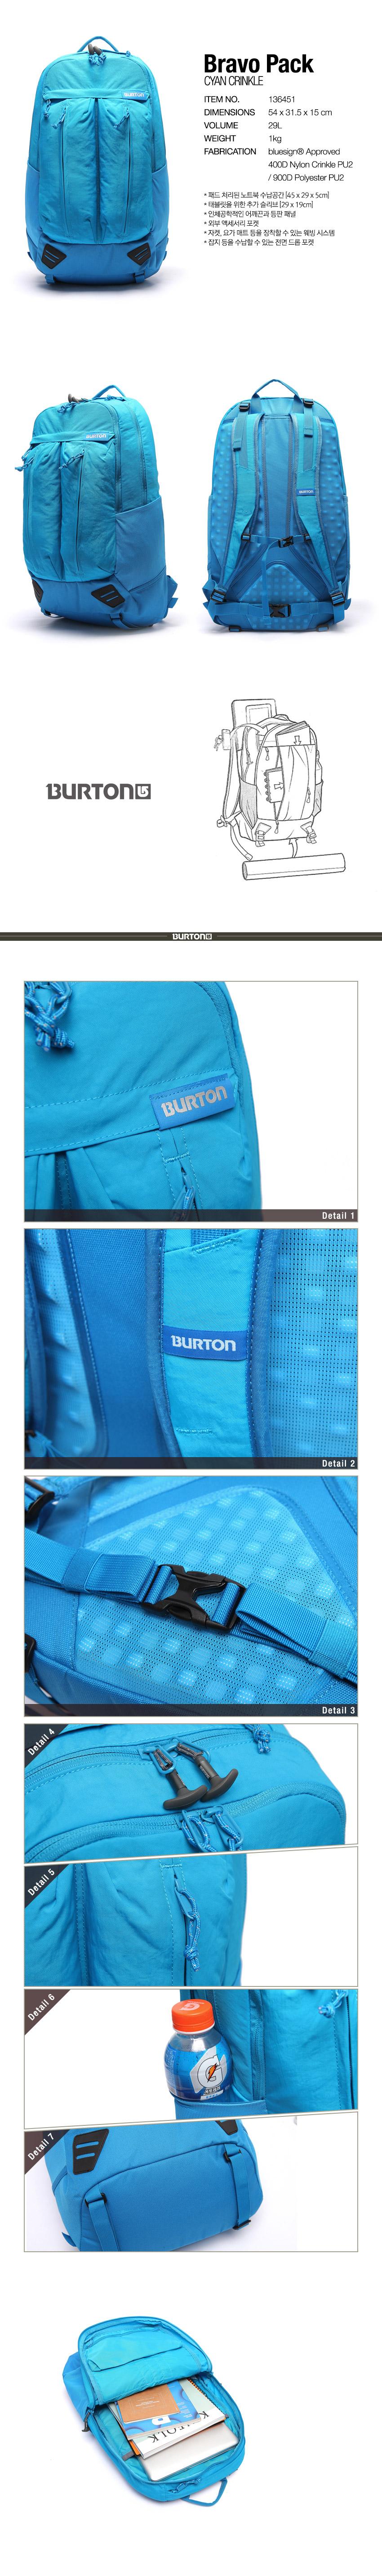 burton_264140.jpg